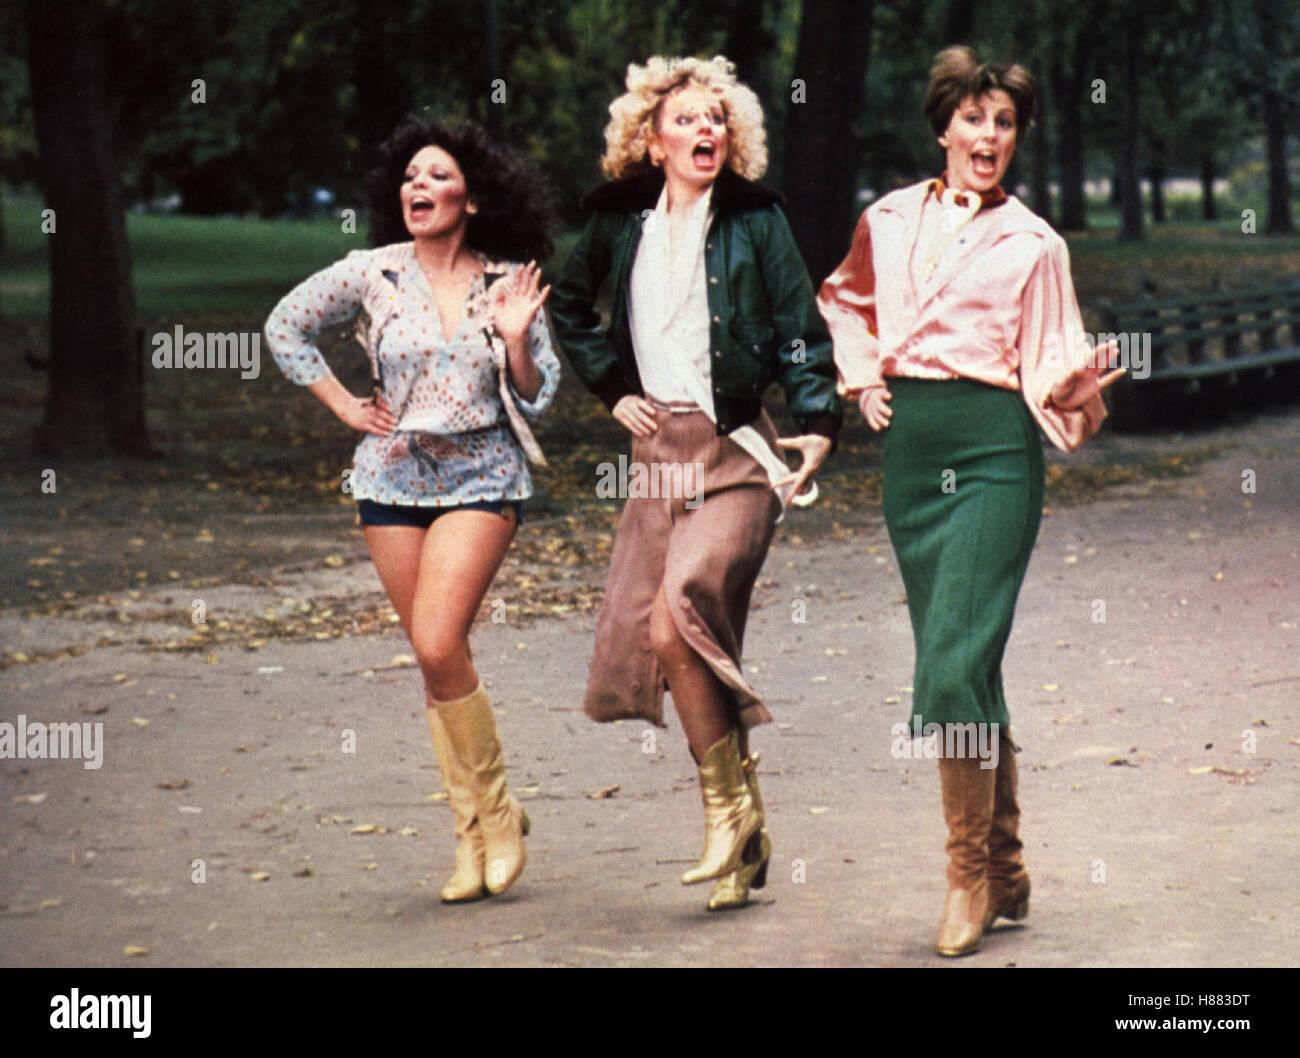 Paula Bauersmith,Diane Stevenett Hot pics Caroline Williams,Liv Tyler